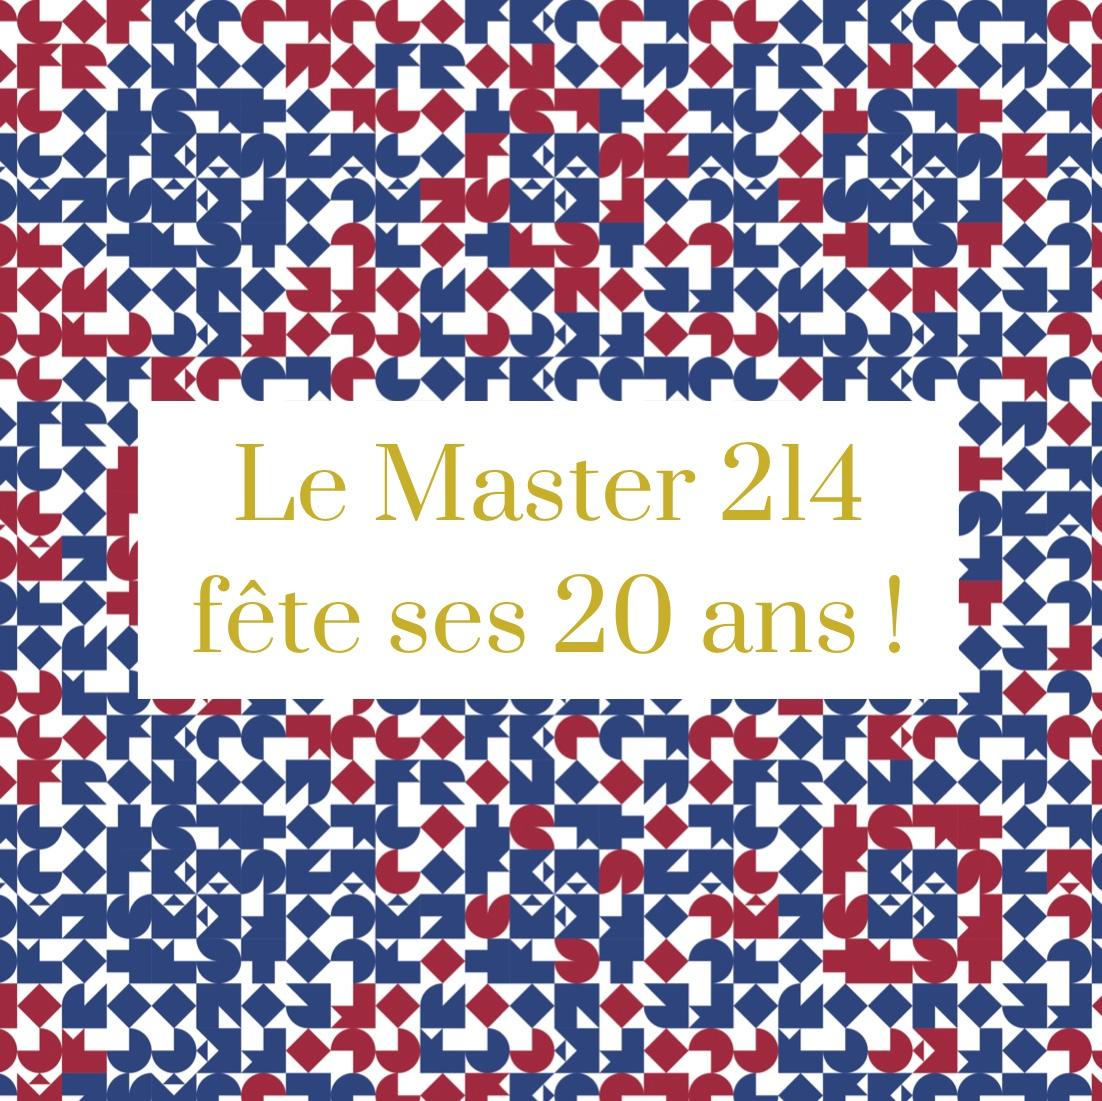 Le-Master-214-fête-ses-20-ans (1).jpg